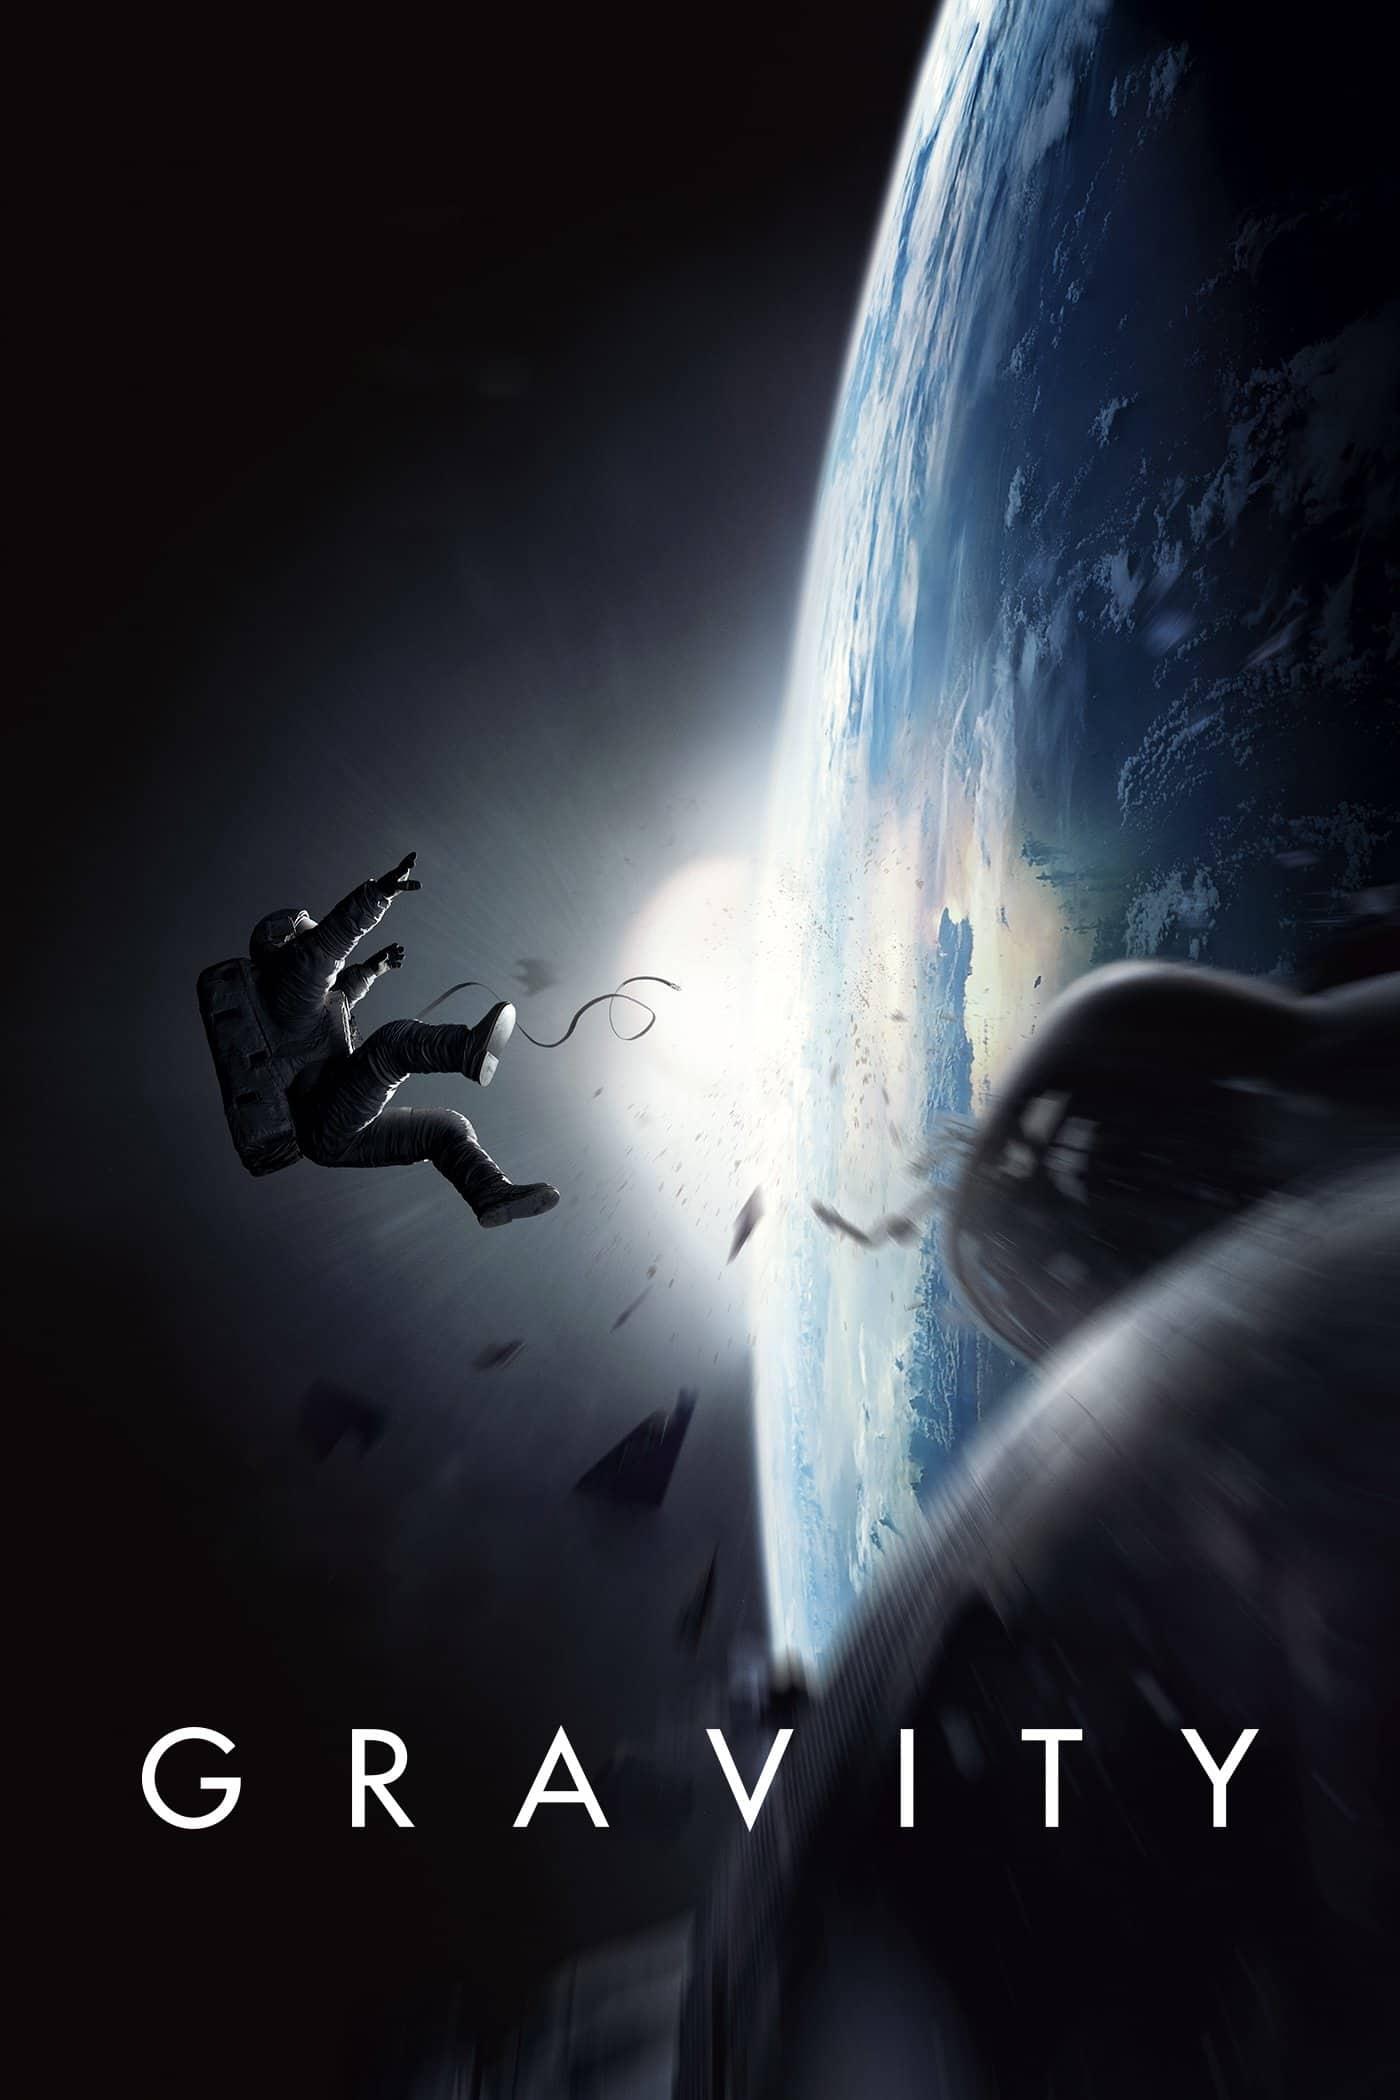 Gravity, 2013